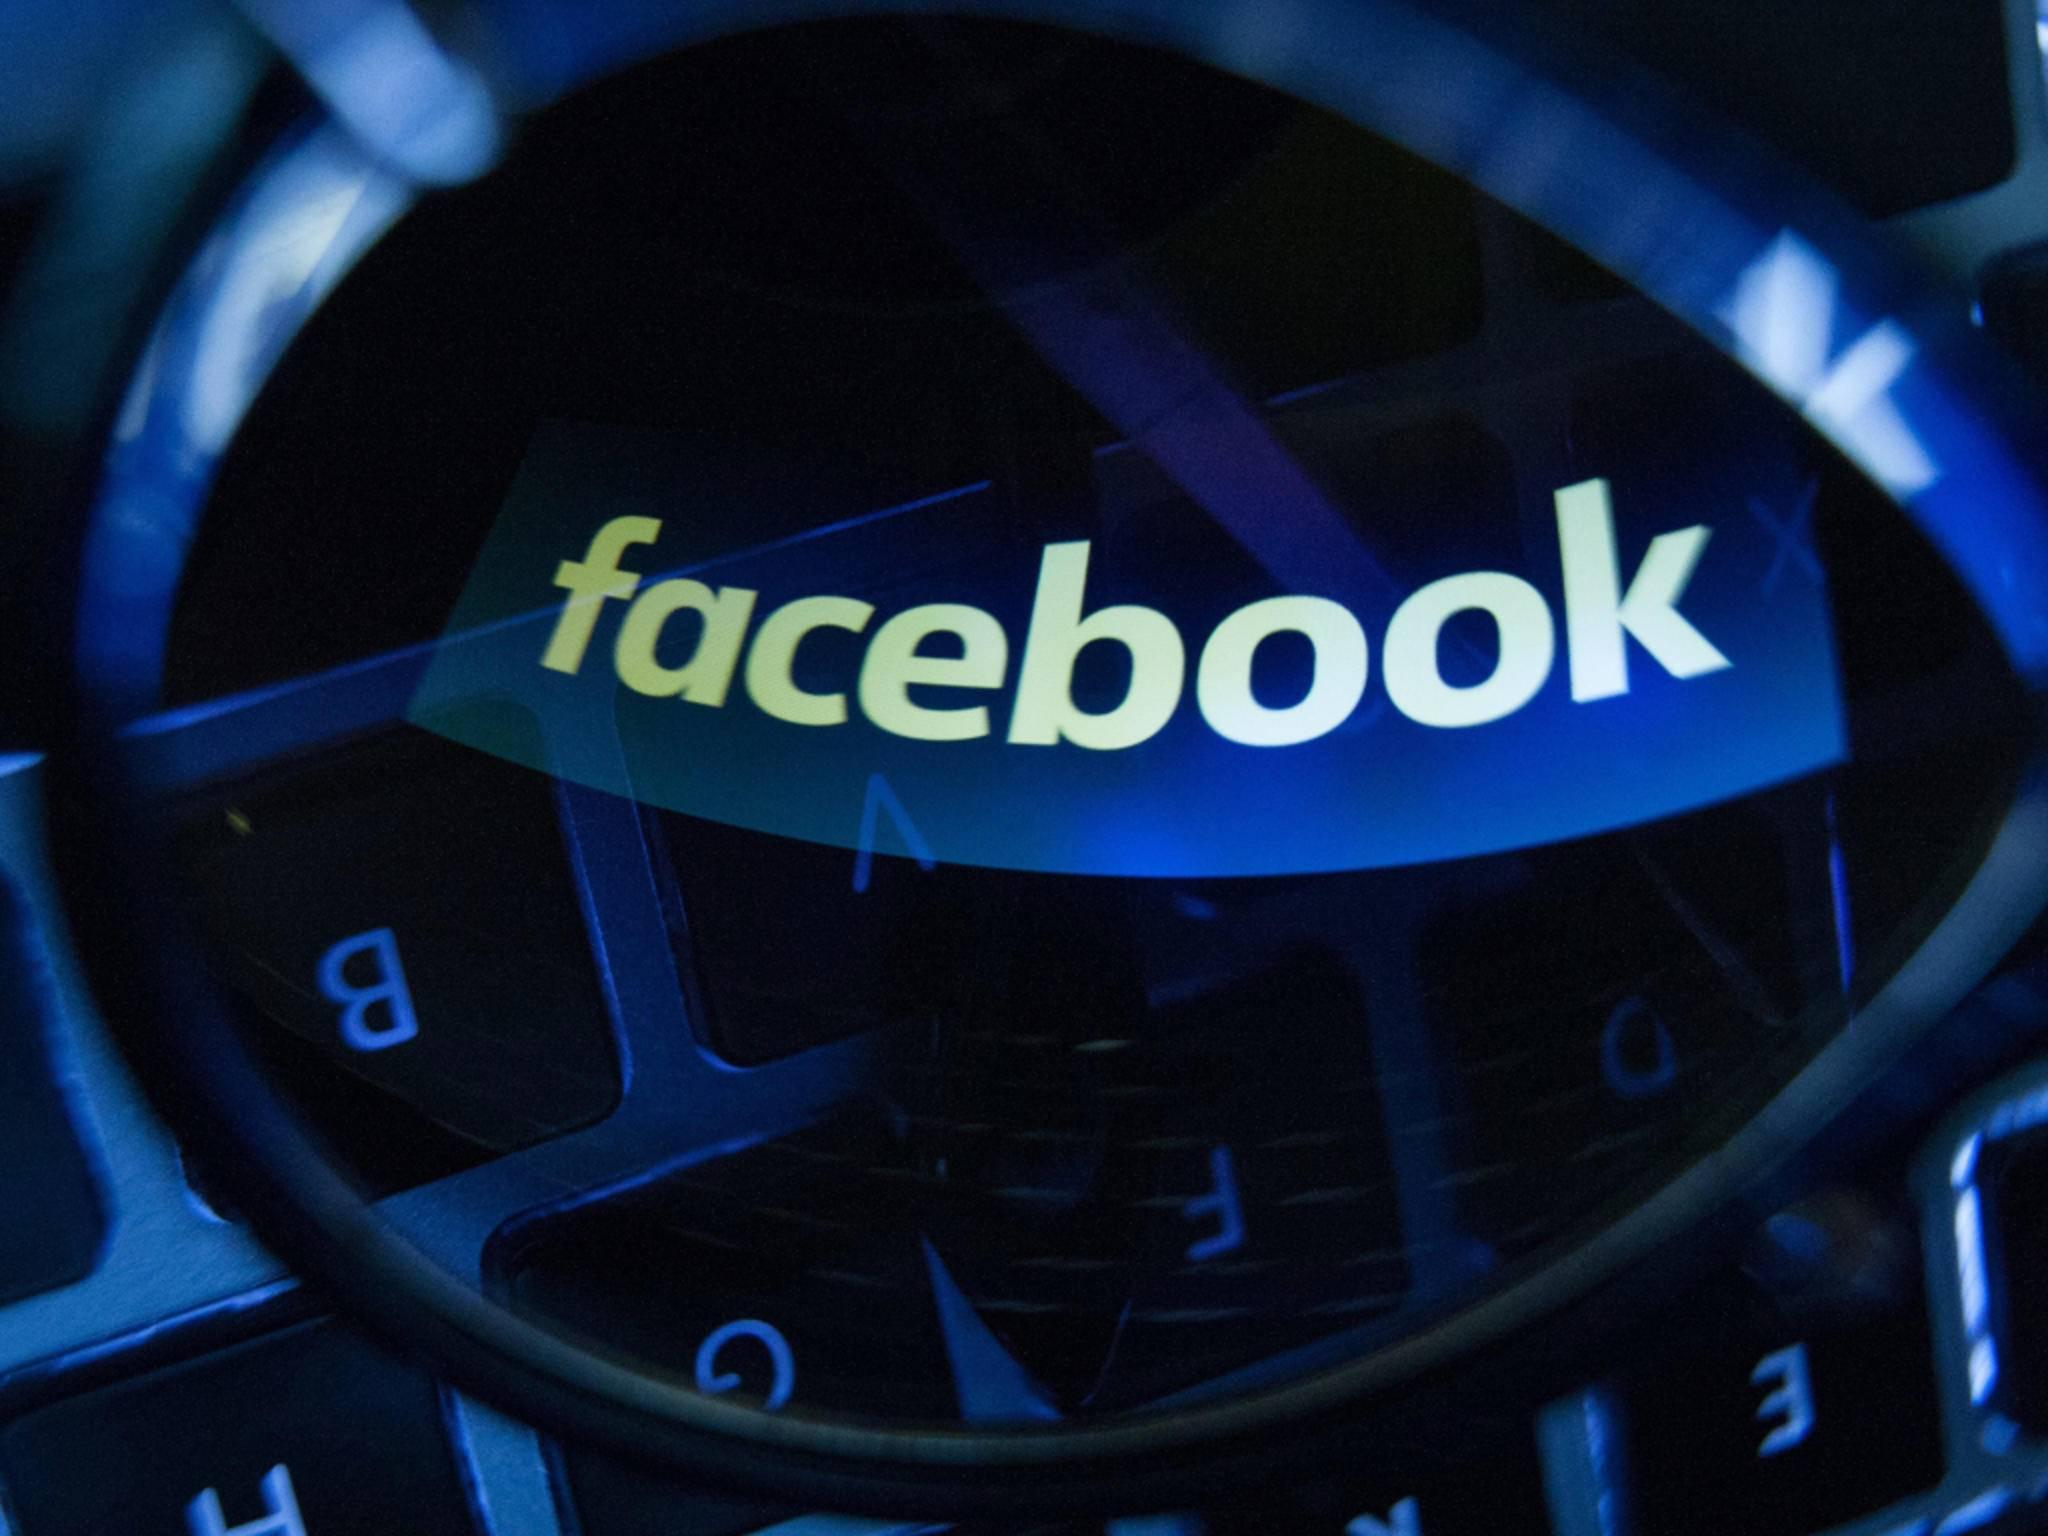 Unterdrückt Facebook konservative Meinungen in den Trending Topics?